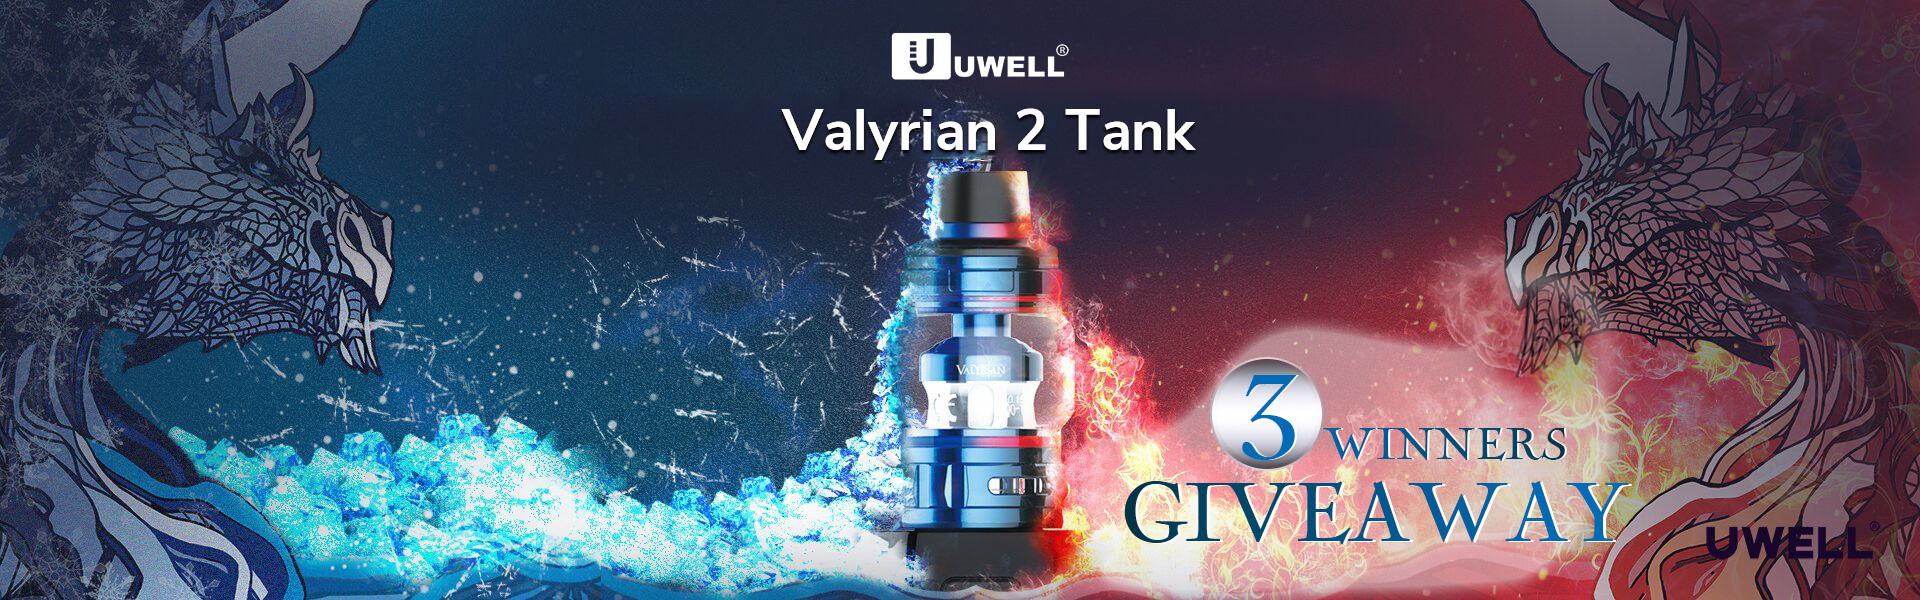 Uwell-Valyrian-2-Tank